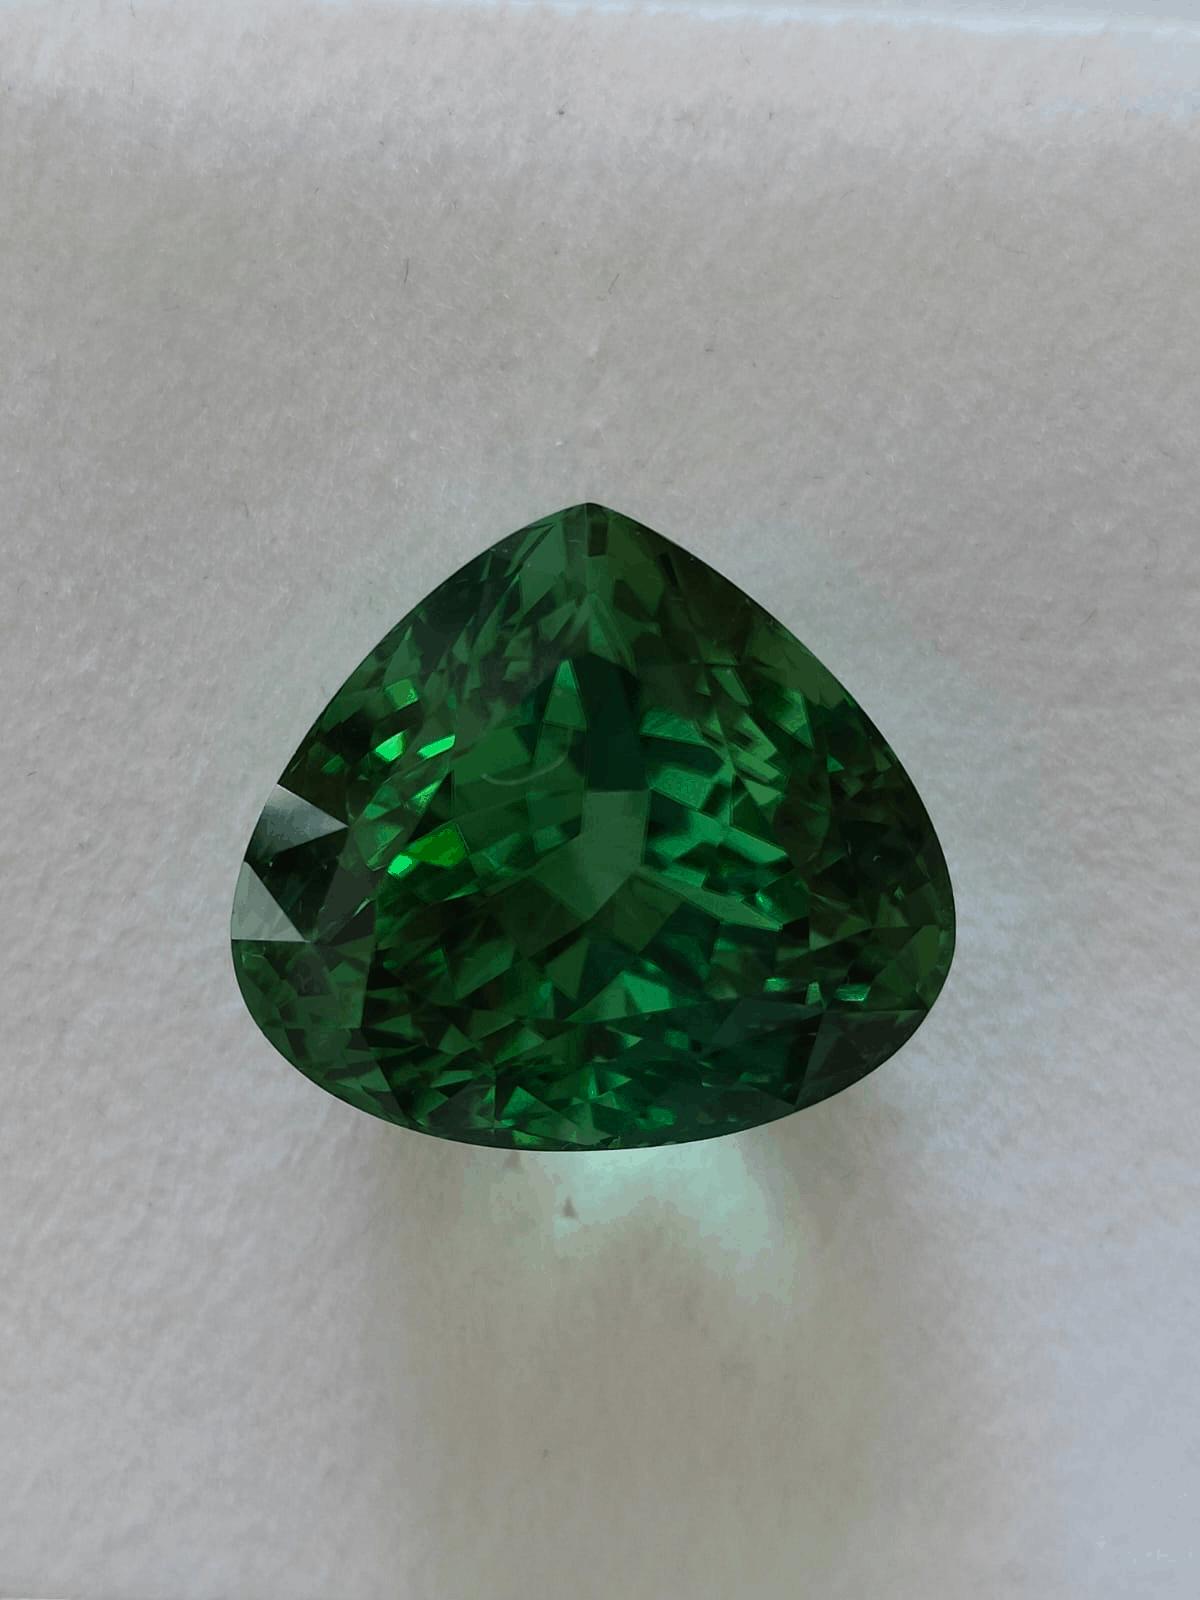 43.50-ct green tourmaline